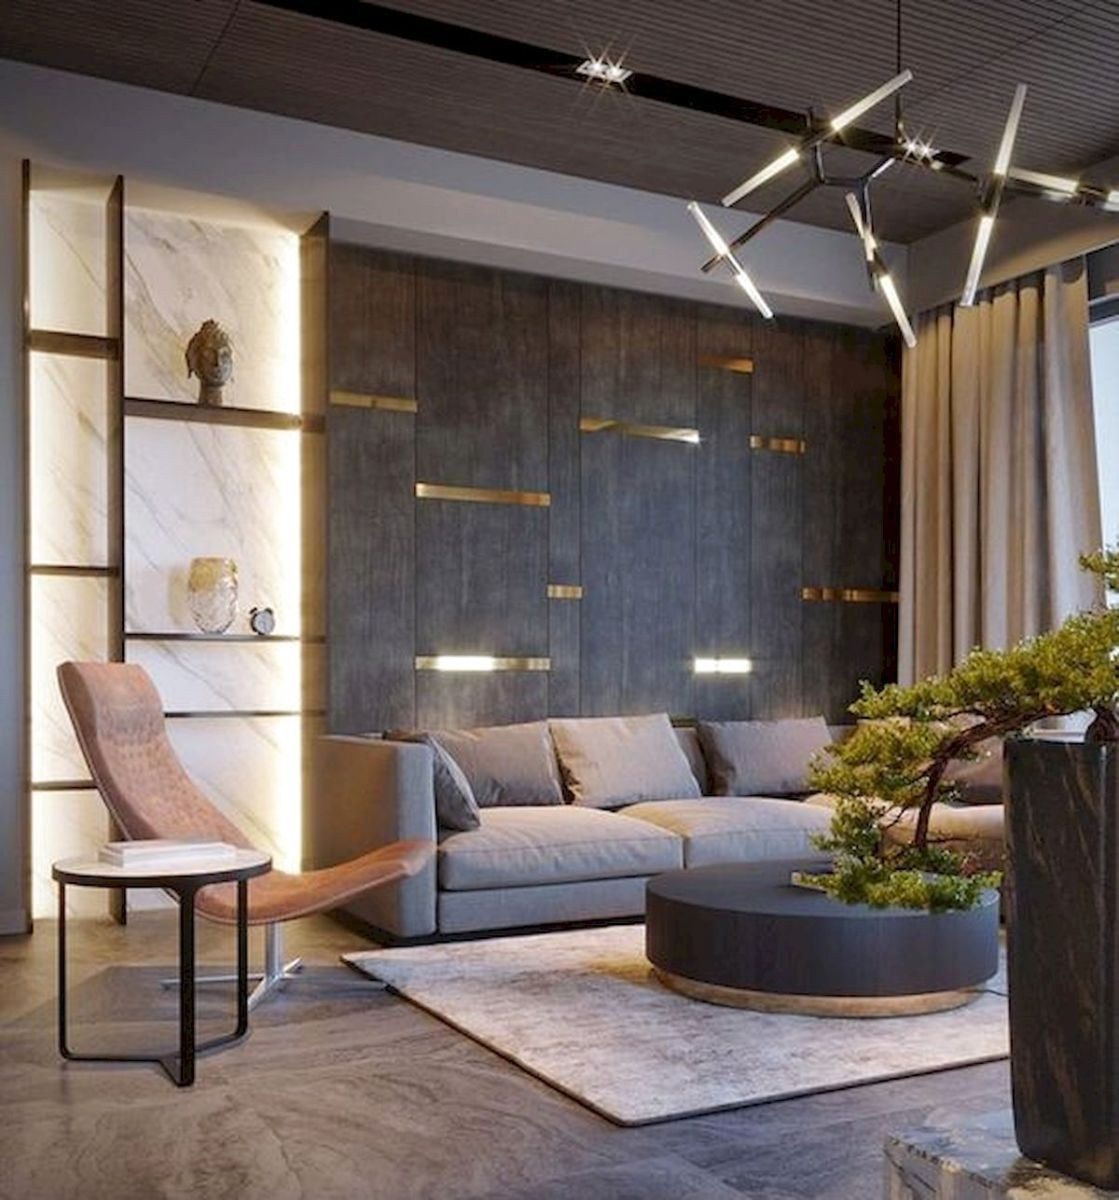 Home Design Ideas Malaysia: 121 Best Living Room Decor Ideas